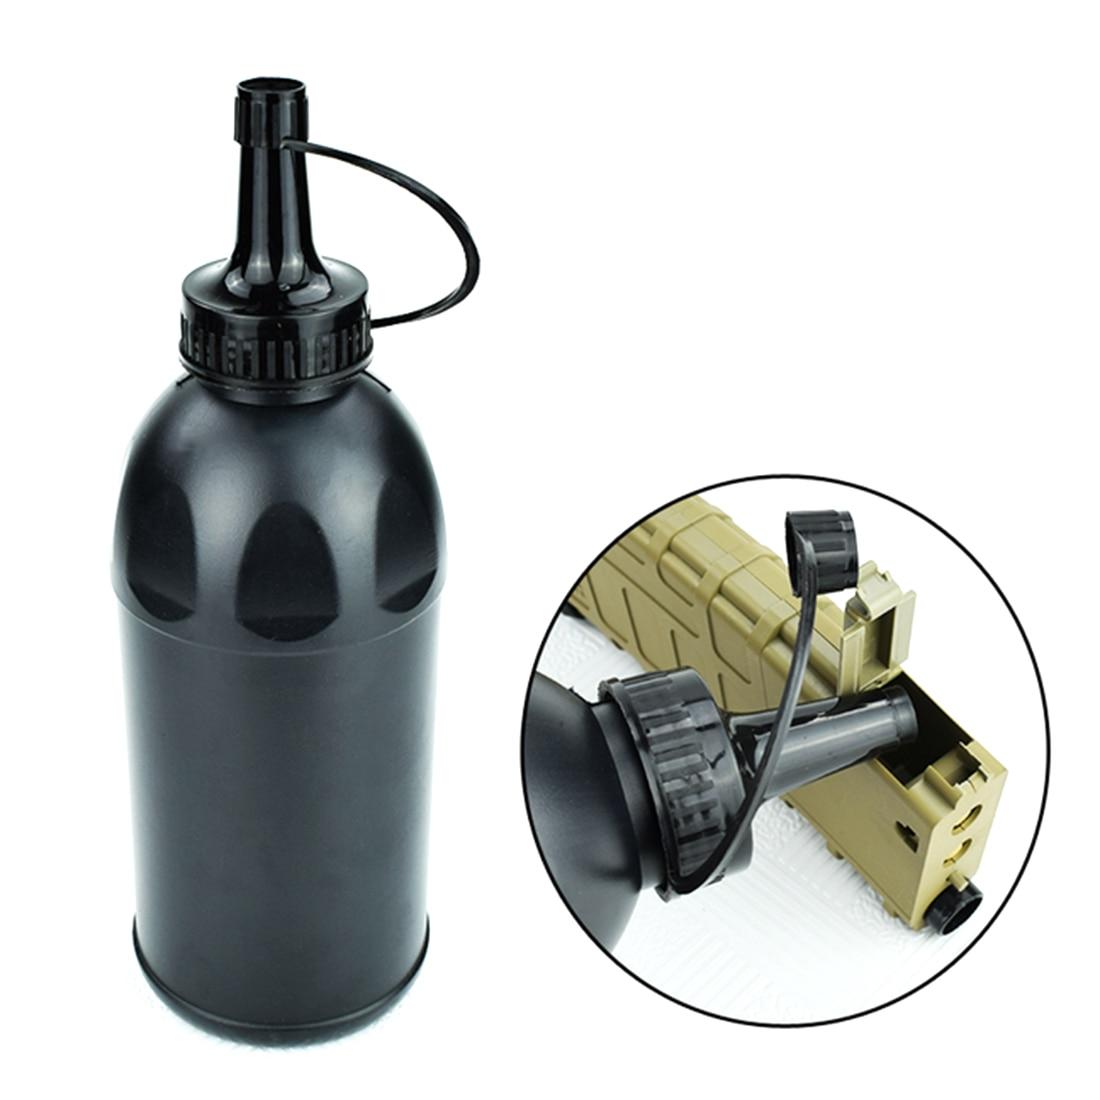 Bullet Artifact Bottle For Water Gel Beads Blaster CS Battle Fitness Outdoor Paintball Loading Accessories- Black